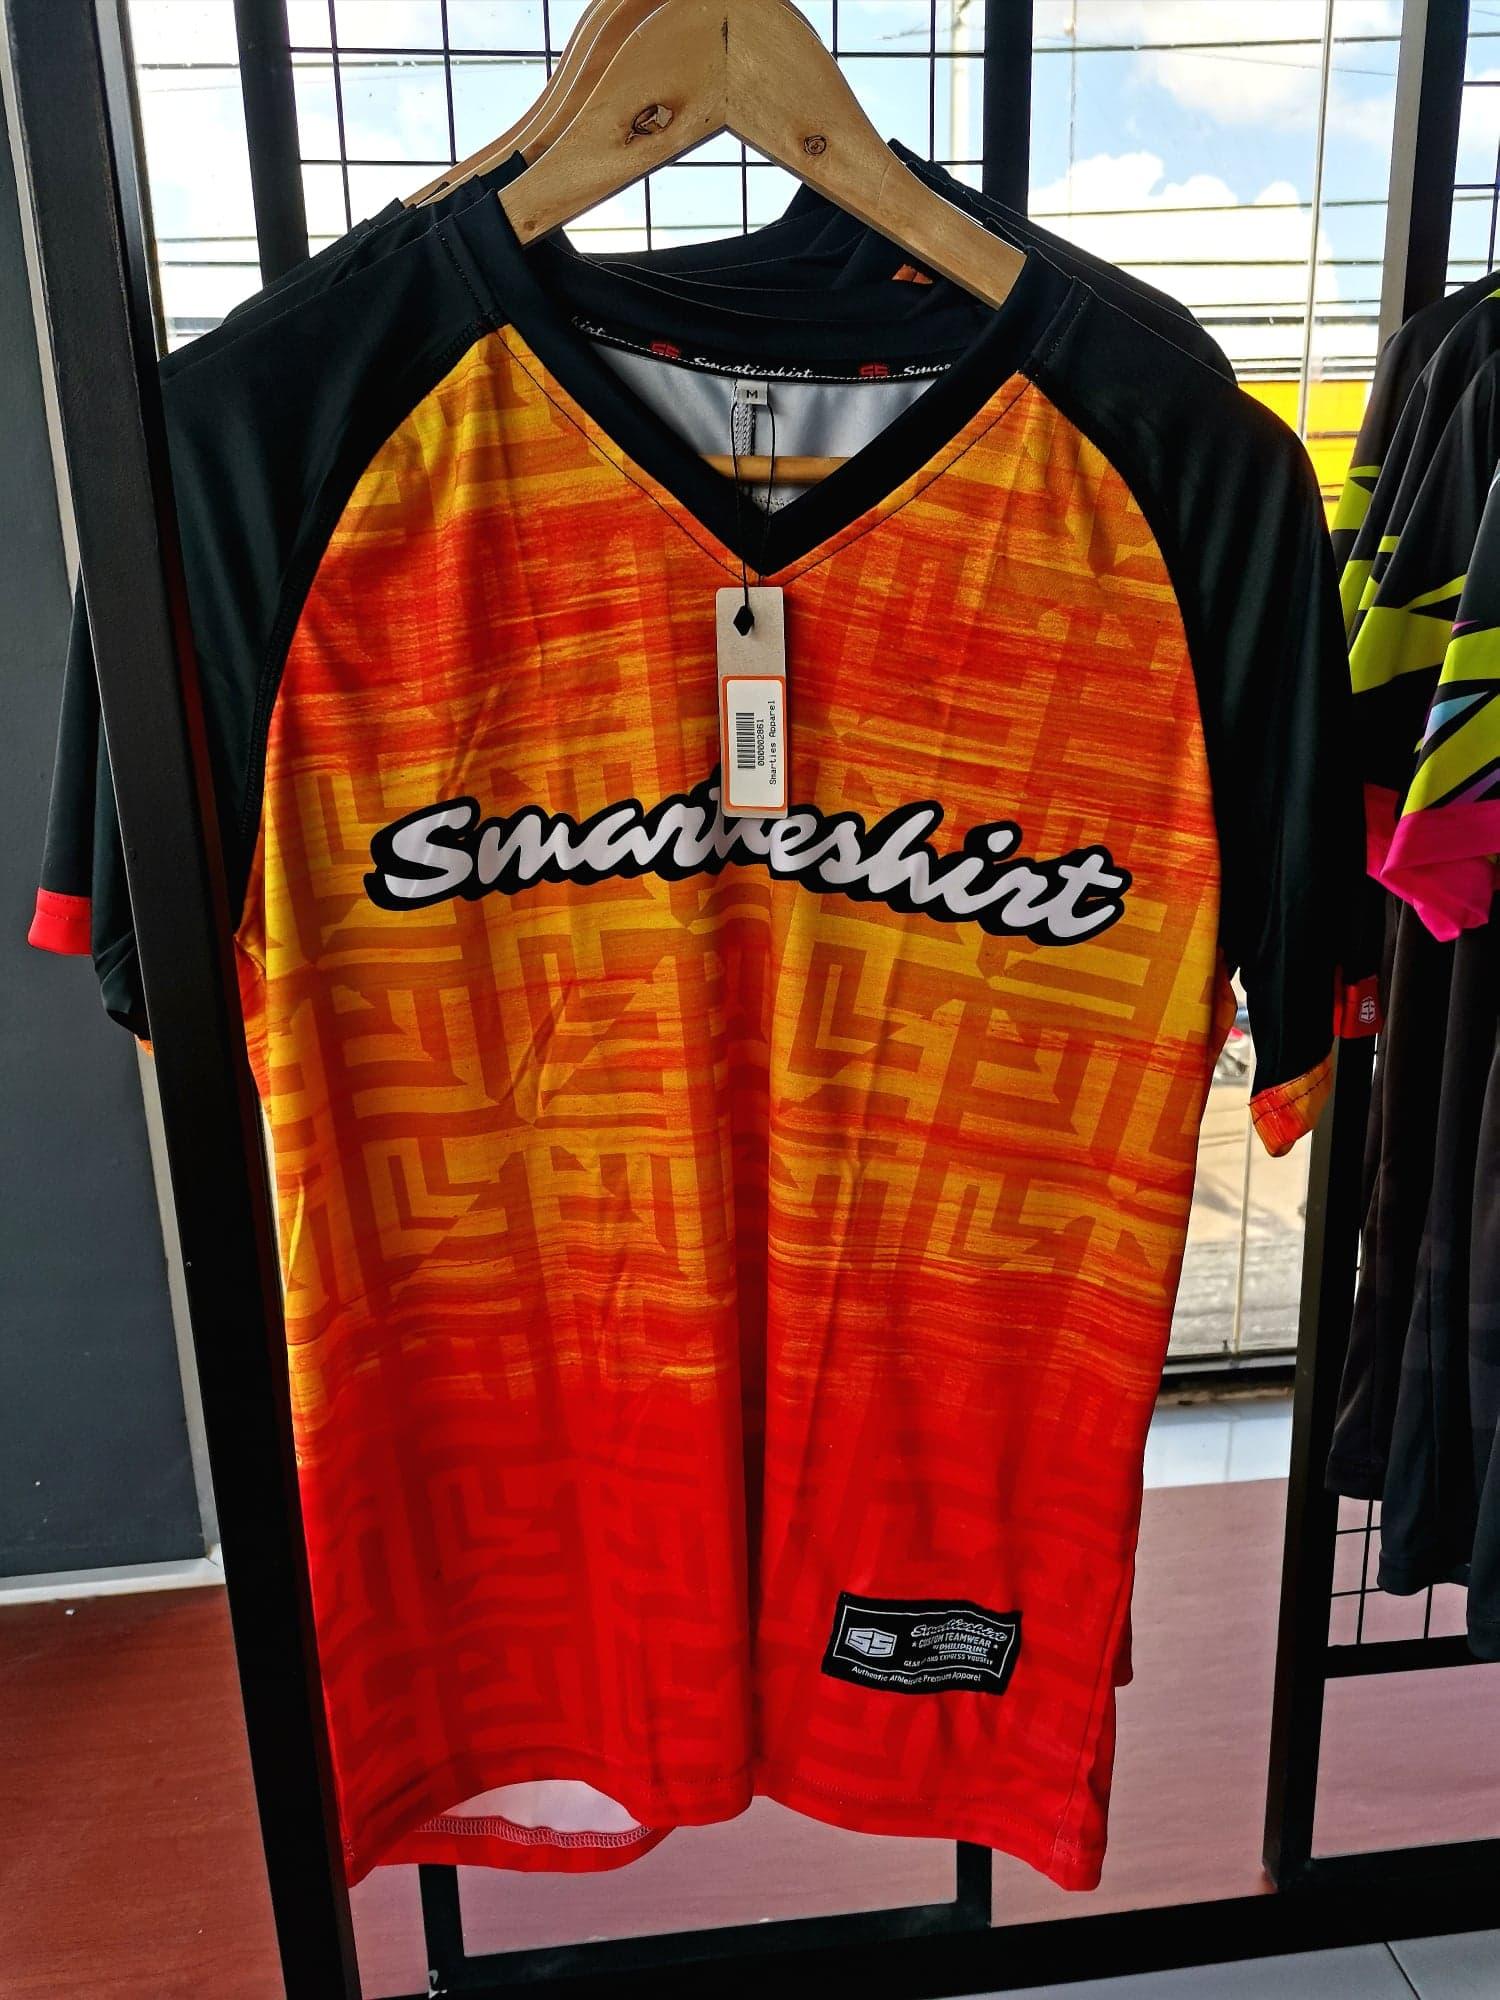 Philiprint Short Sleeves Shirt Smartieshirt Volleyball Jersey (black sleeves)